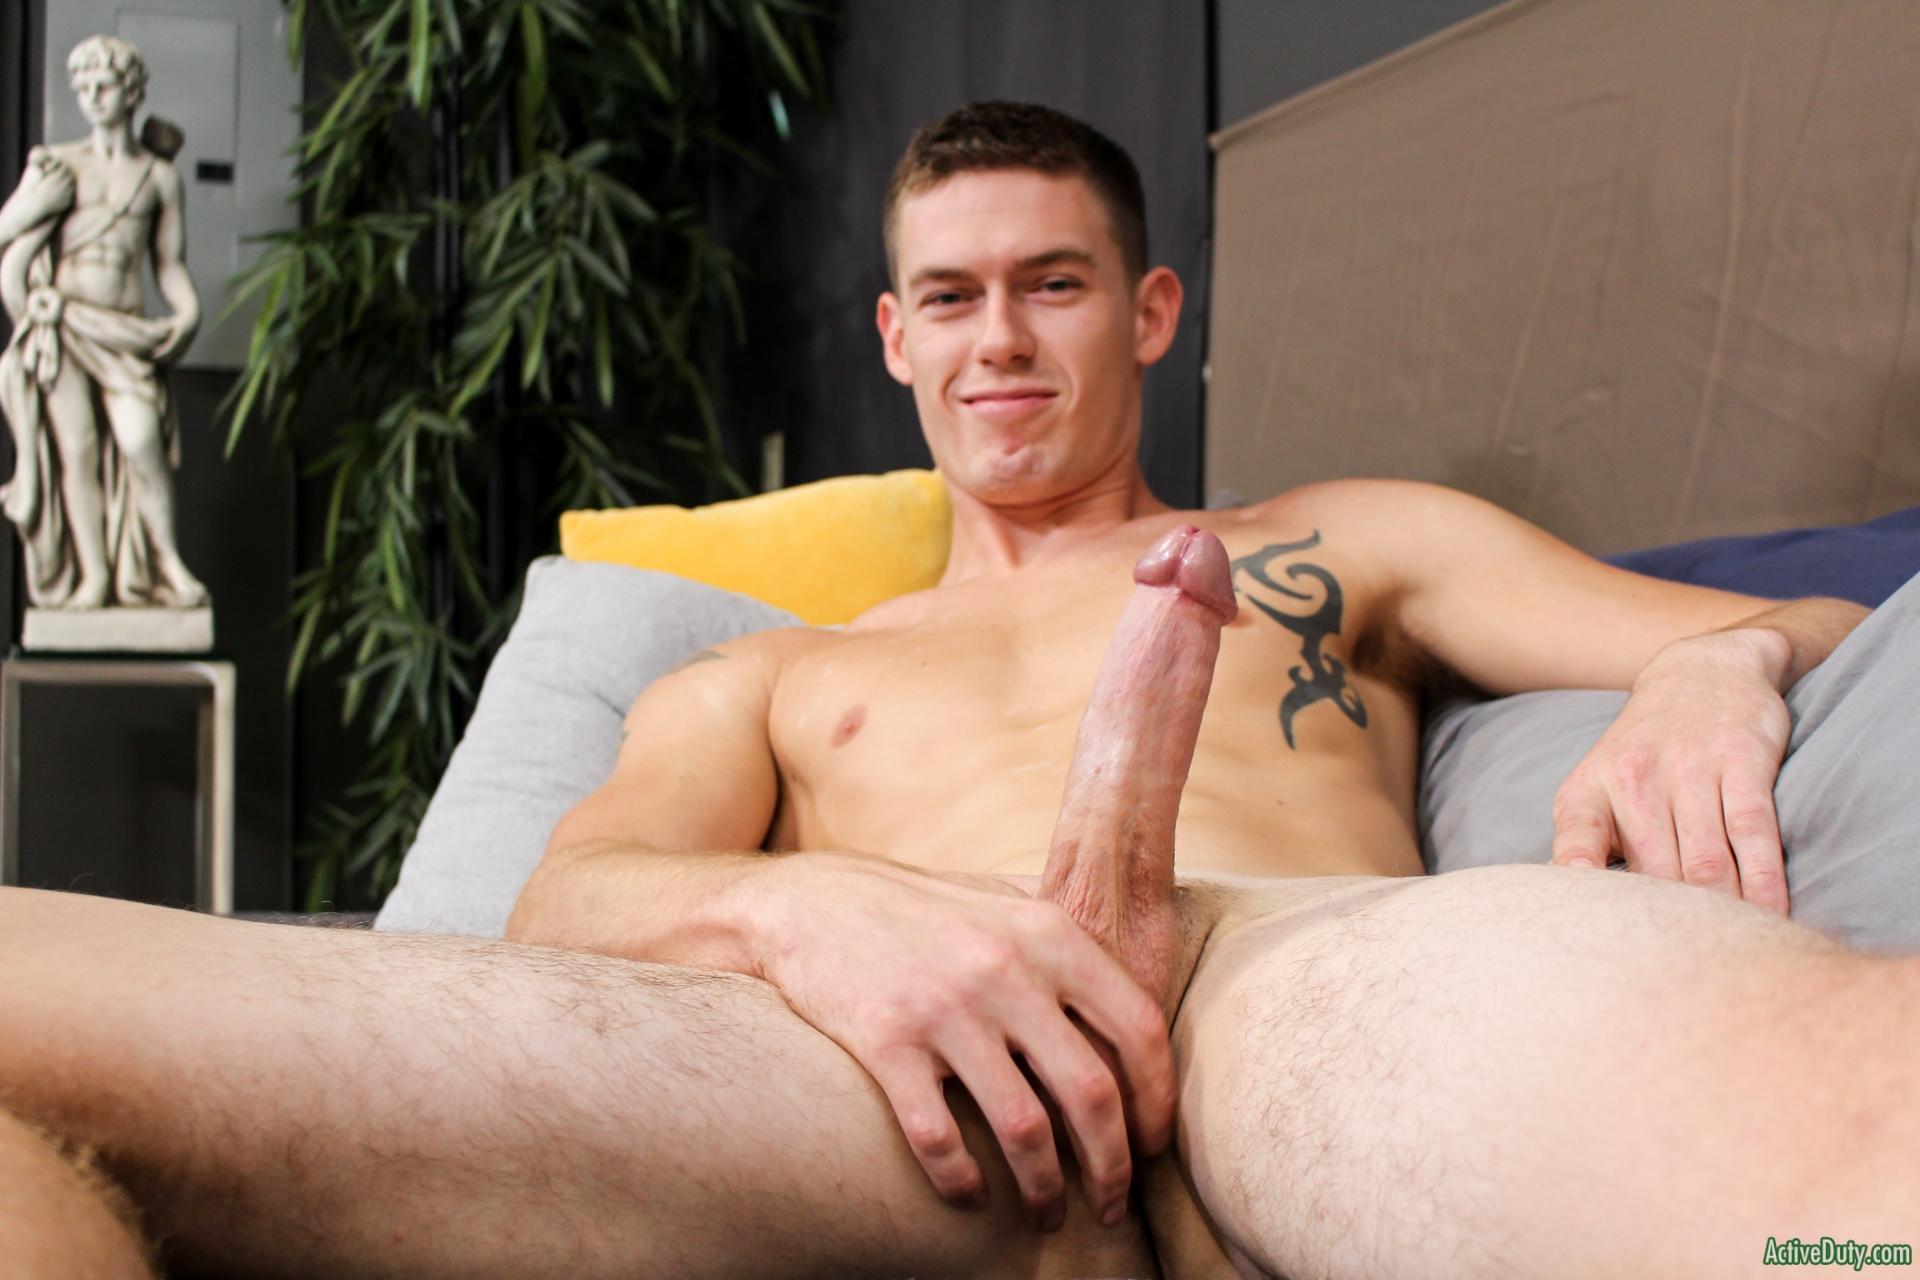 tyler-layton-active-duty-gay-porn-2